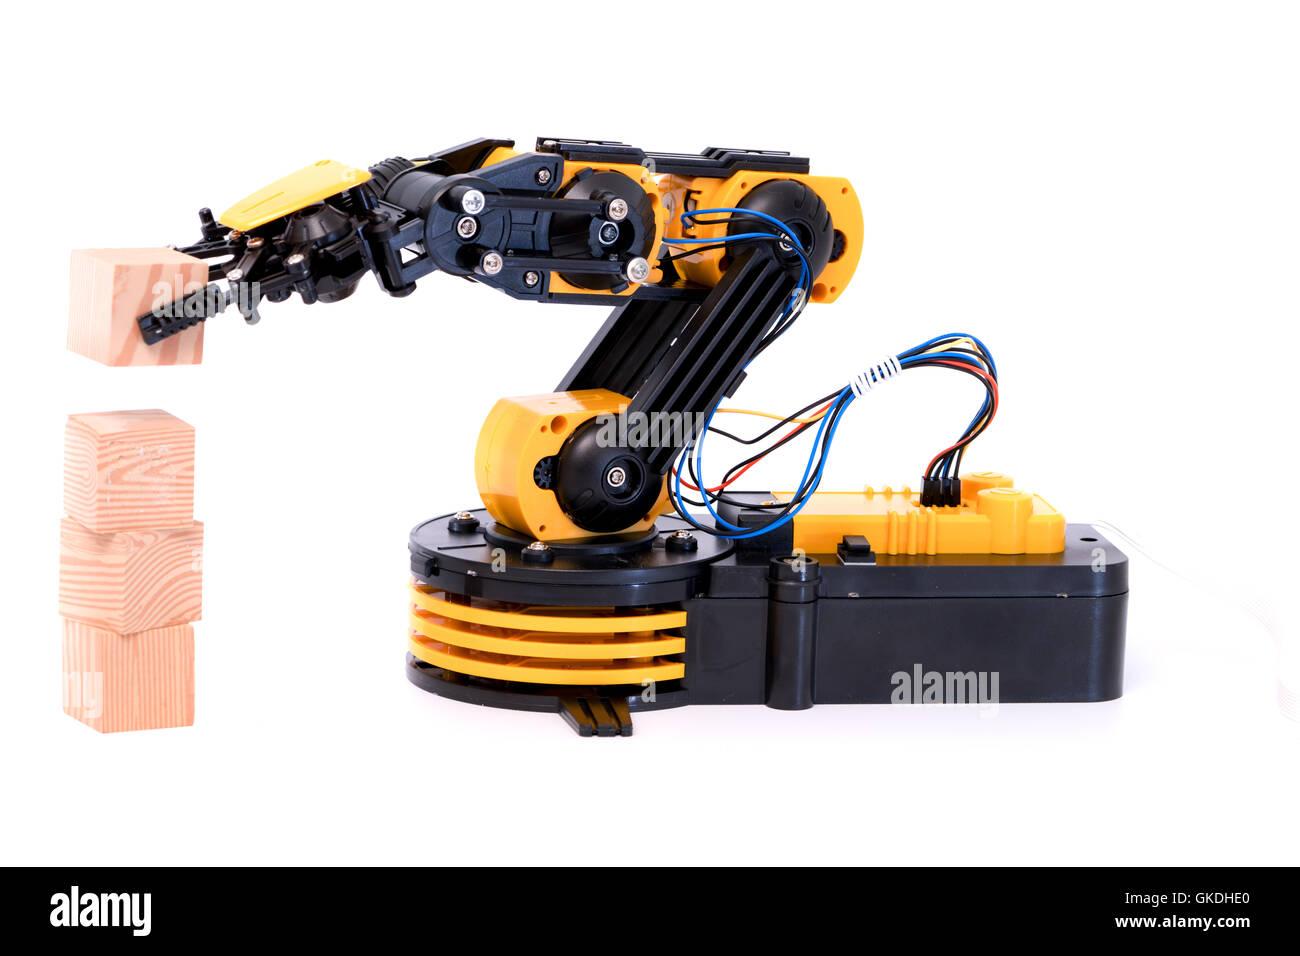 Plastic model of industrial robot arm - Stock Image